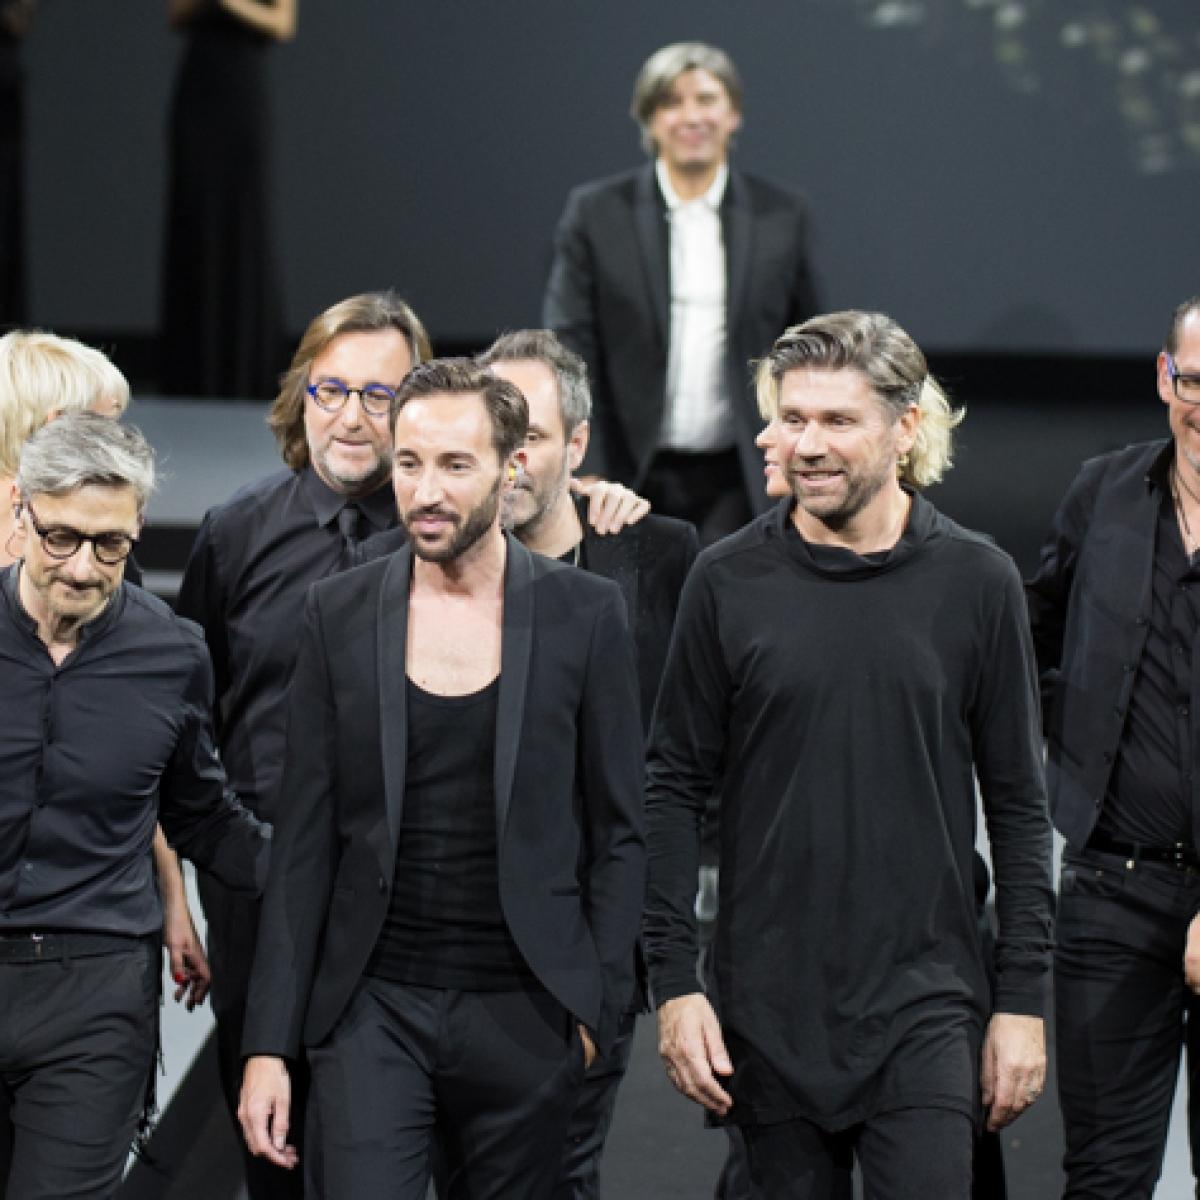 haute coiffure francaise 2016-436